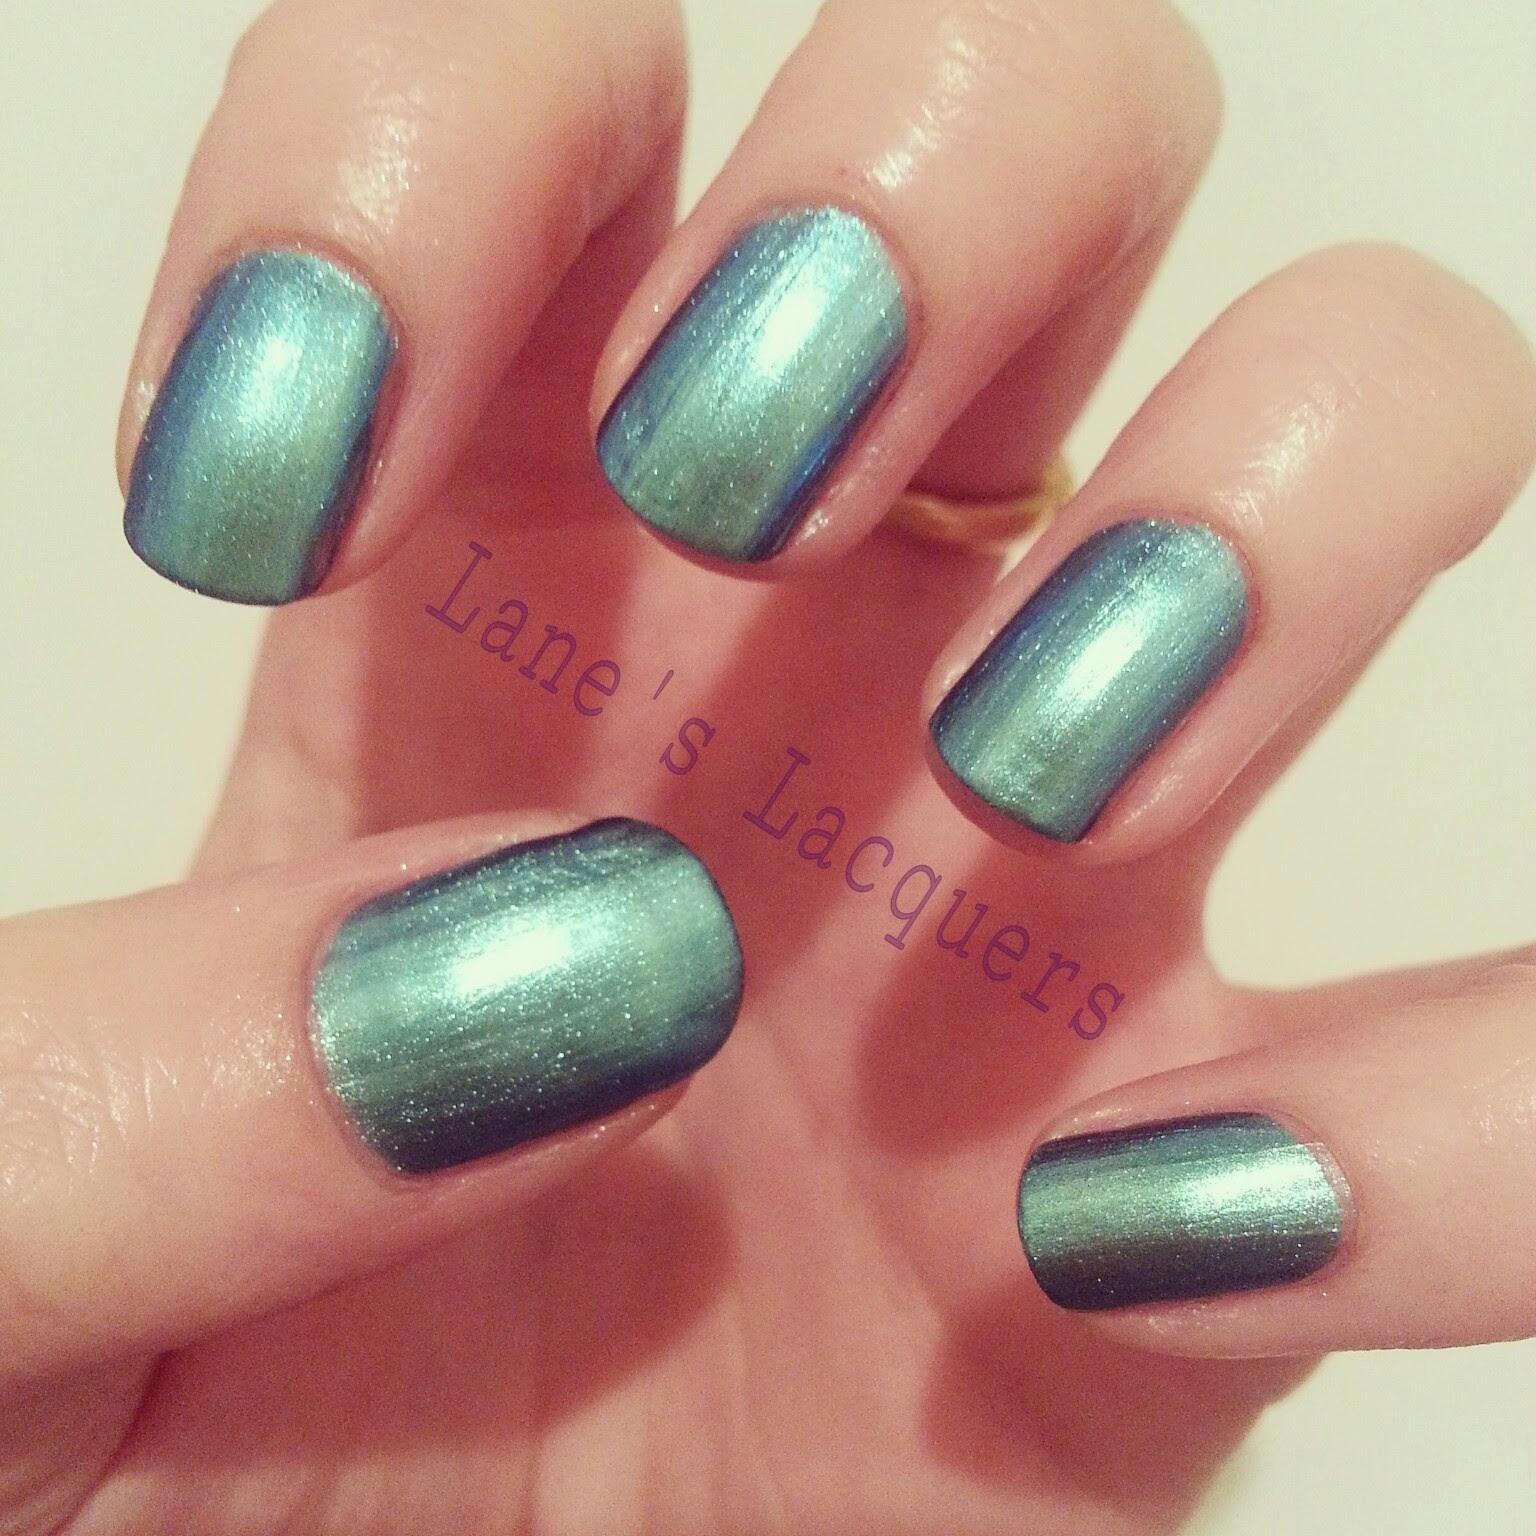 barry-m-aquarium-blue-aqnp6-swatch-manicure